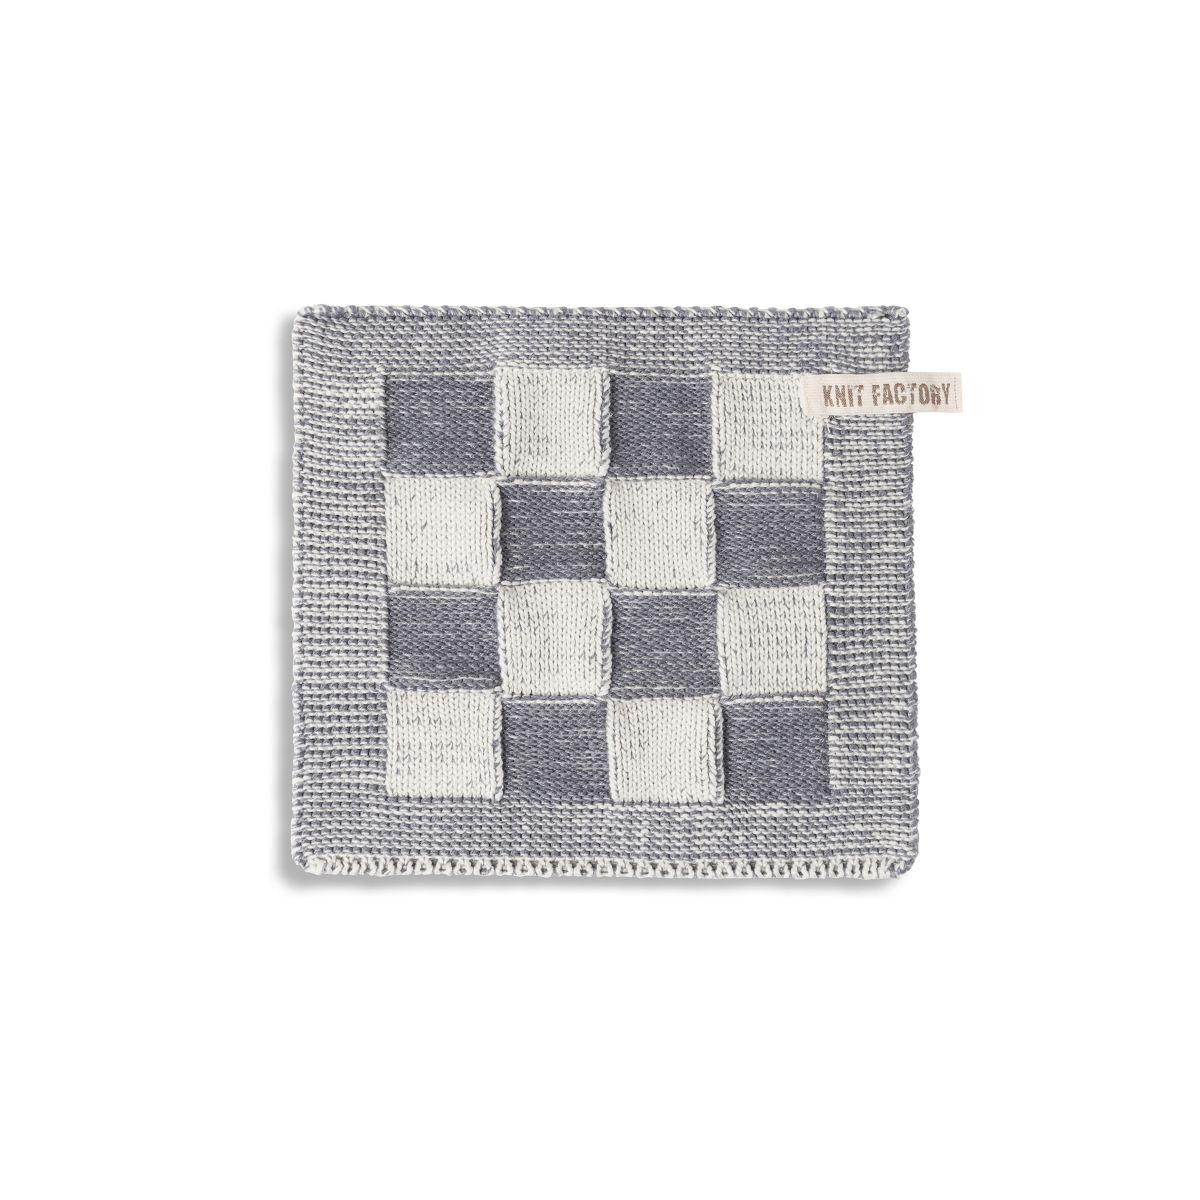 knit factory 2010379 pannenlap grote blok 2 kleuren ecru med grey